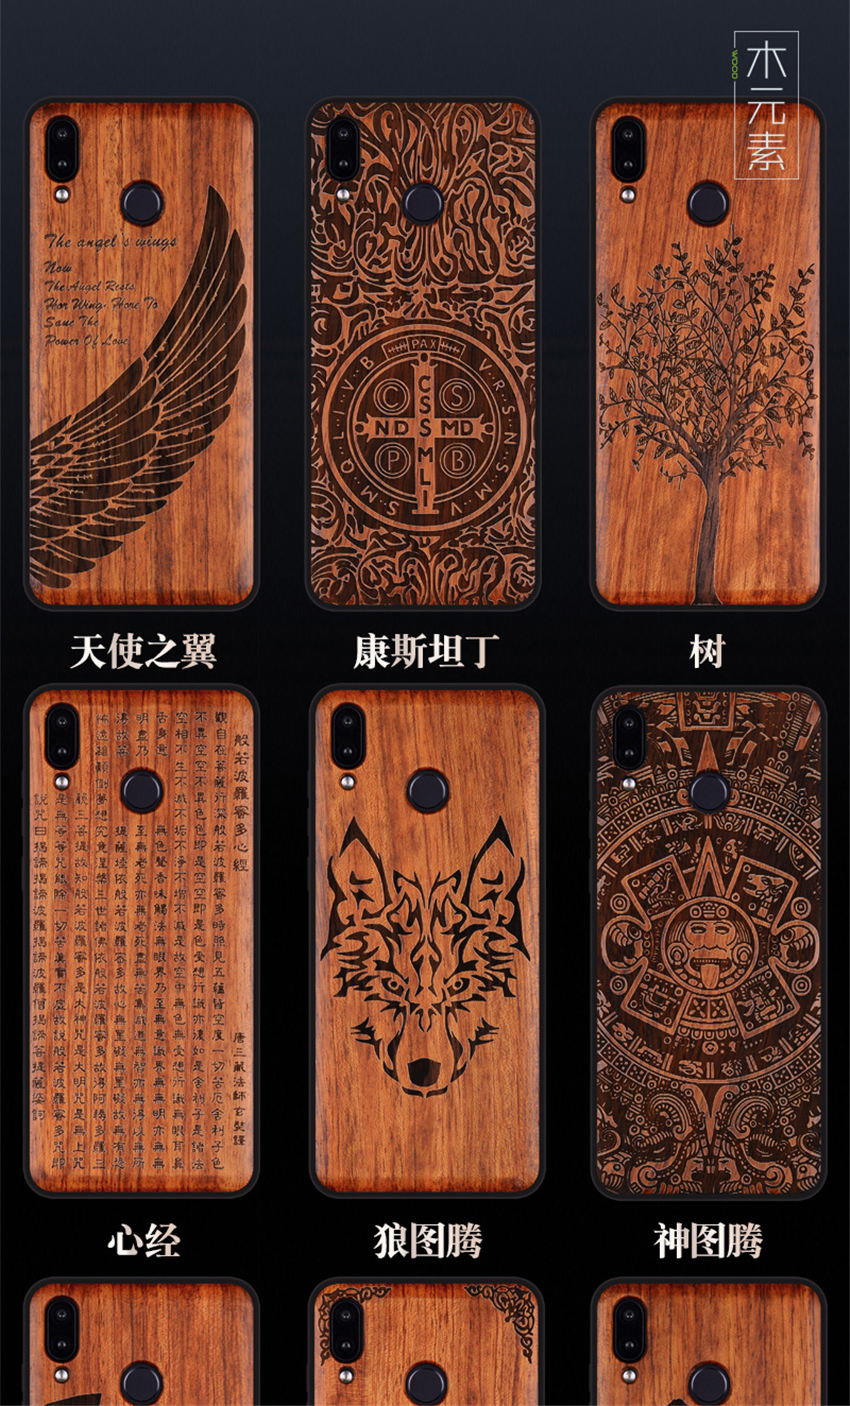 2018 New Huawei Honor 8x Case Slim Wood Back Cover TPU Bumper Case For Huawei Honor 8x Phone Cases Honor-8x (6)